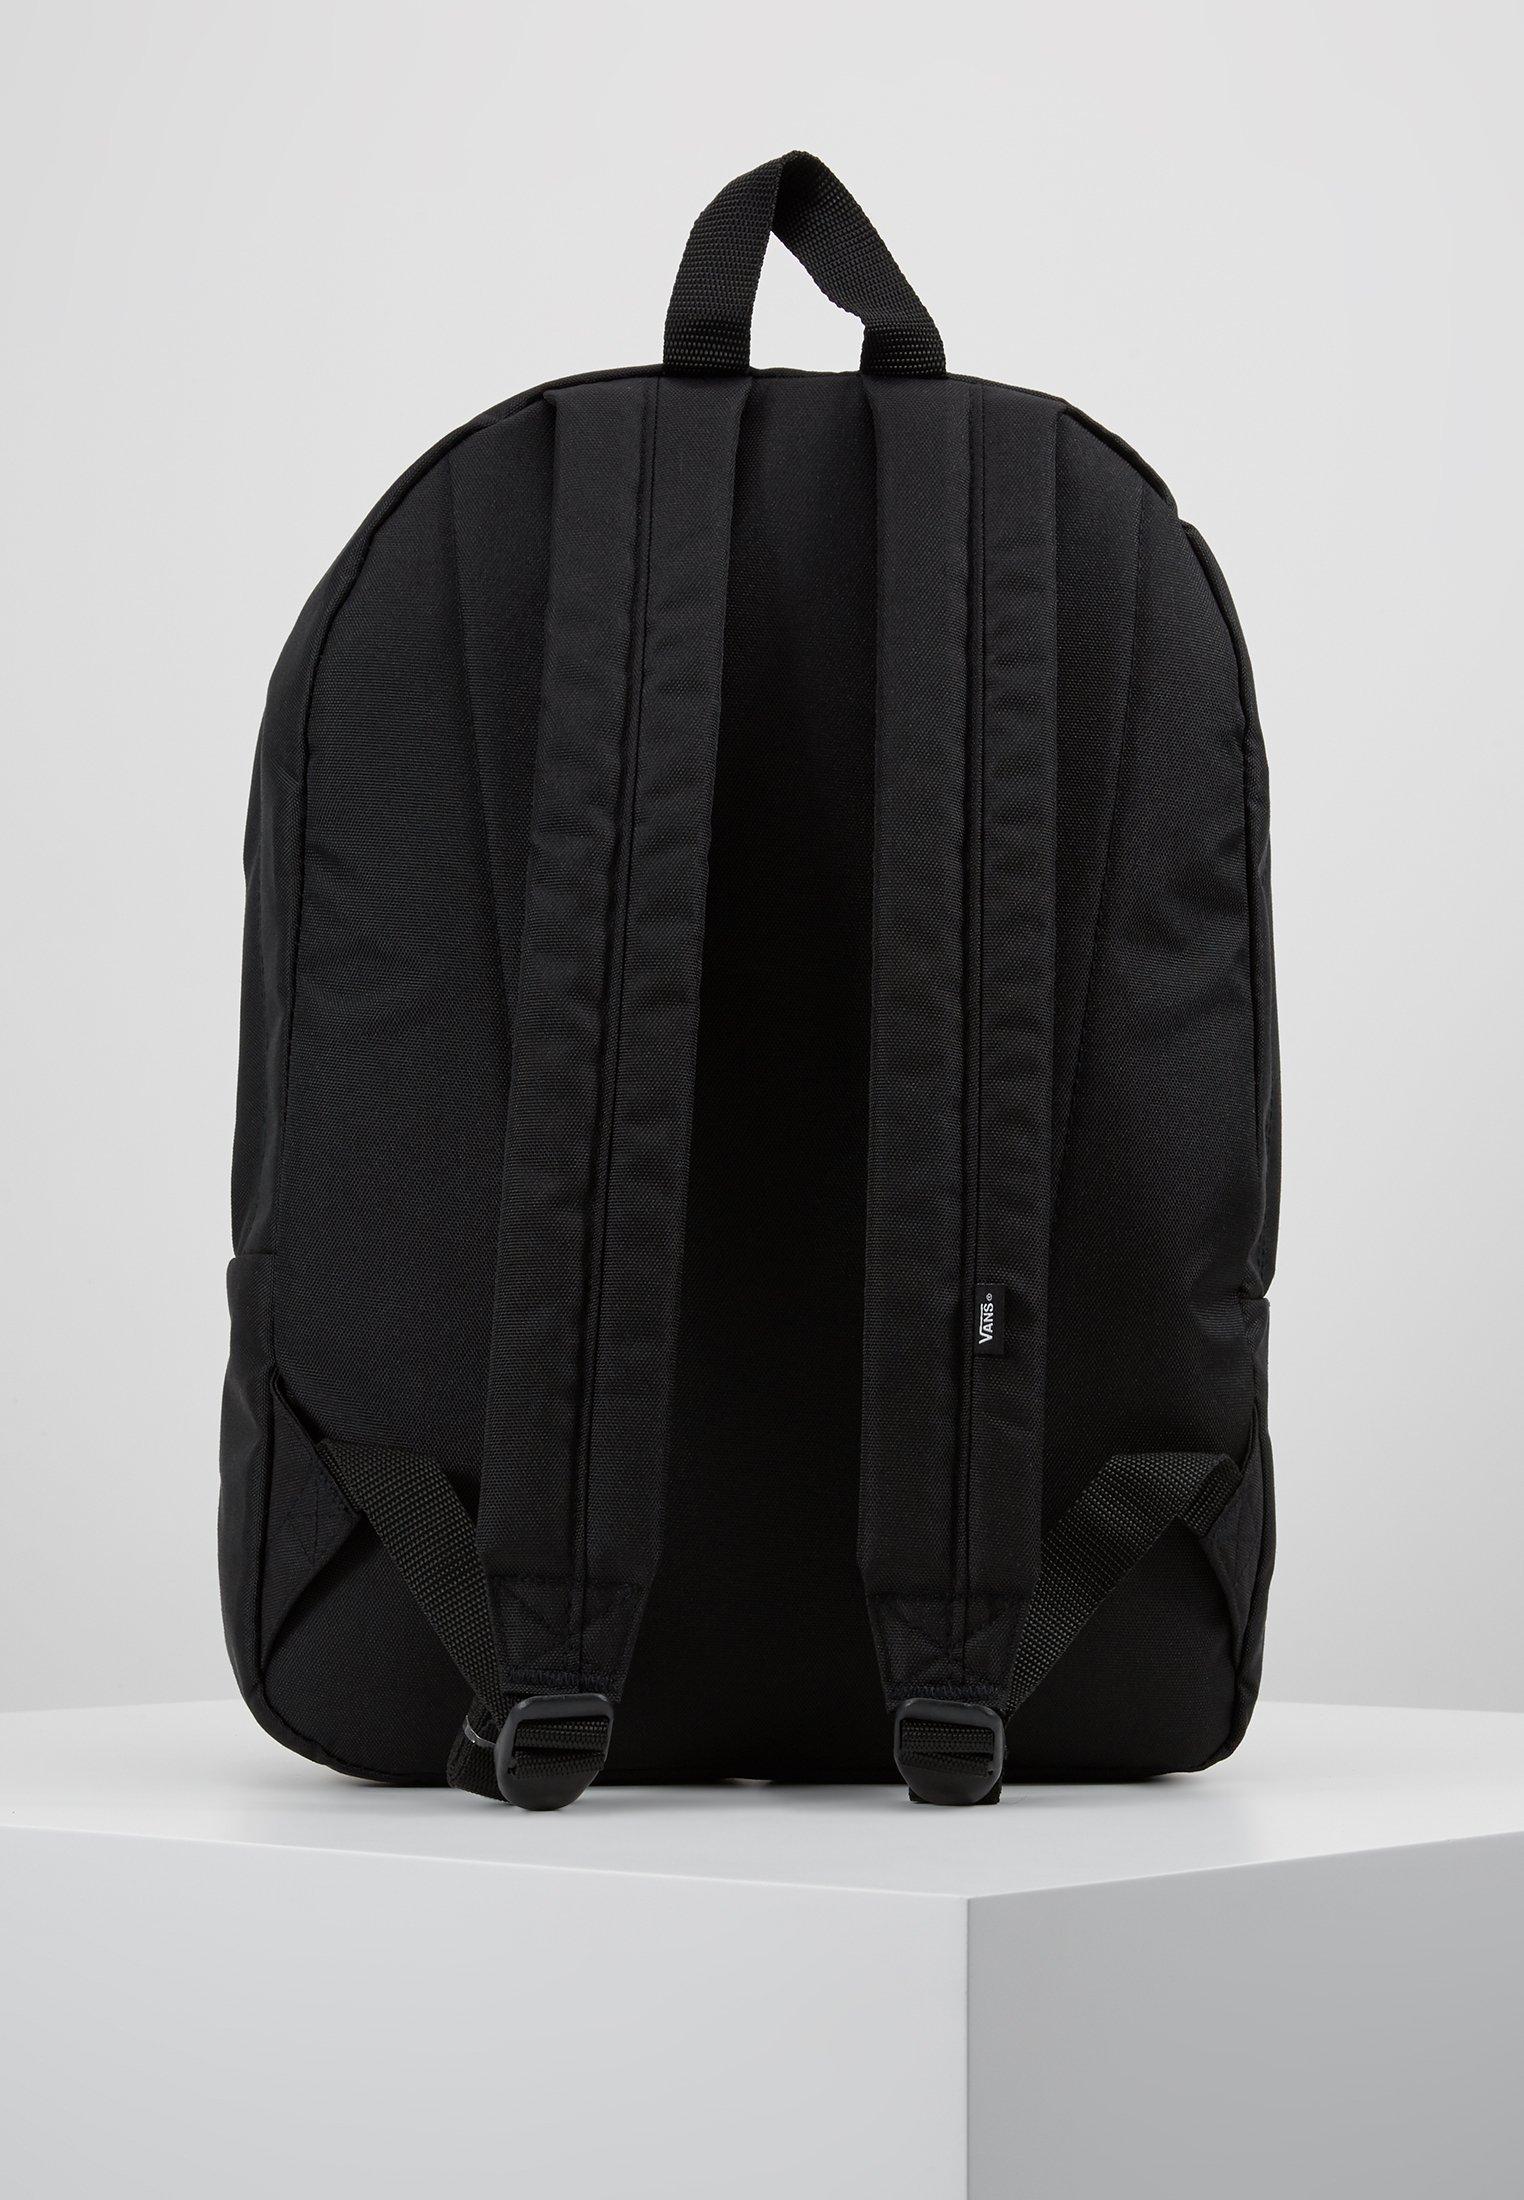 Black white Skool Dos Old Vans BackpackSac À hQxsrCtdBo